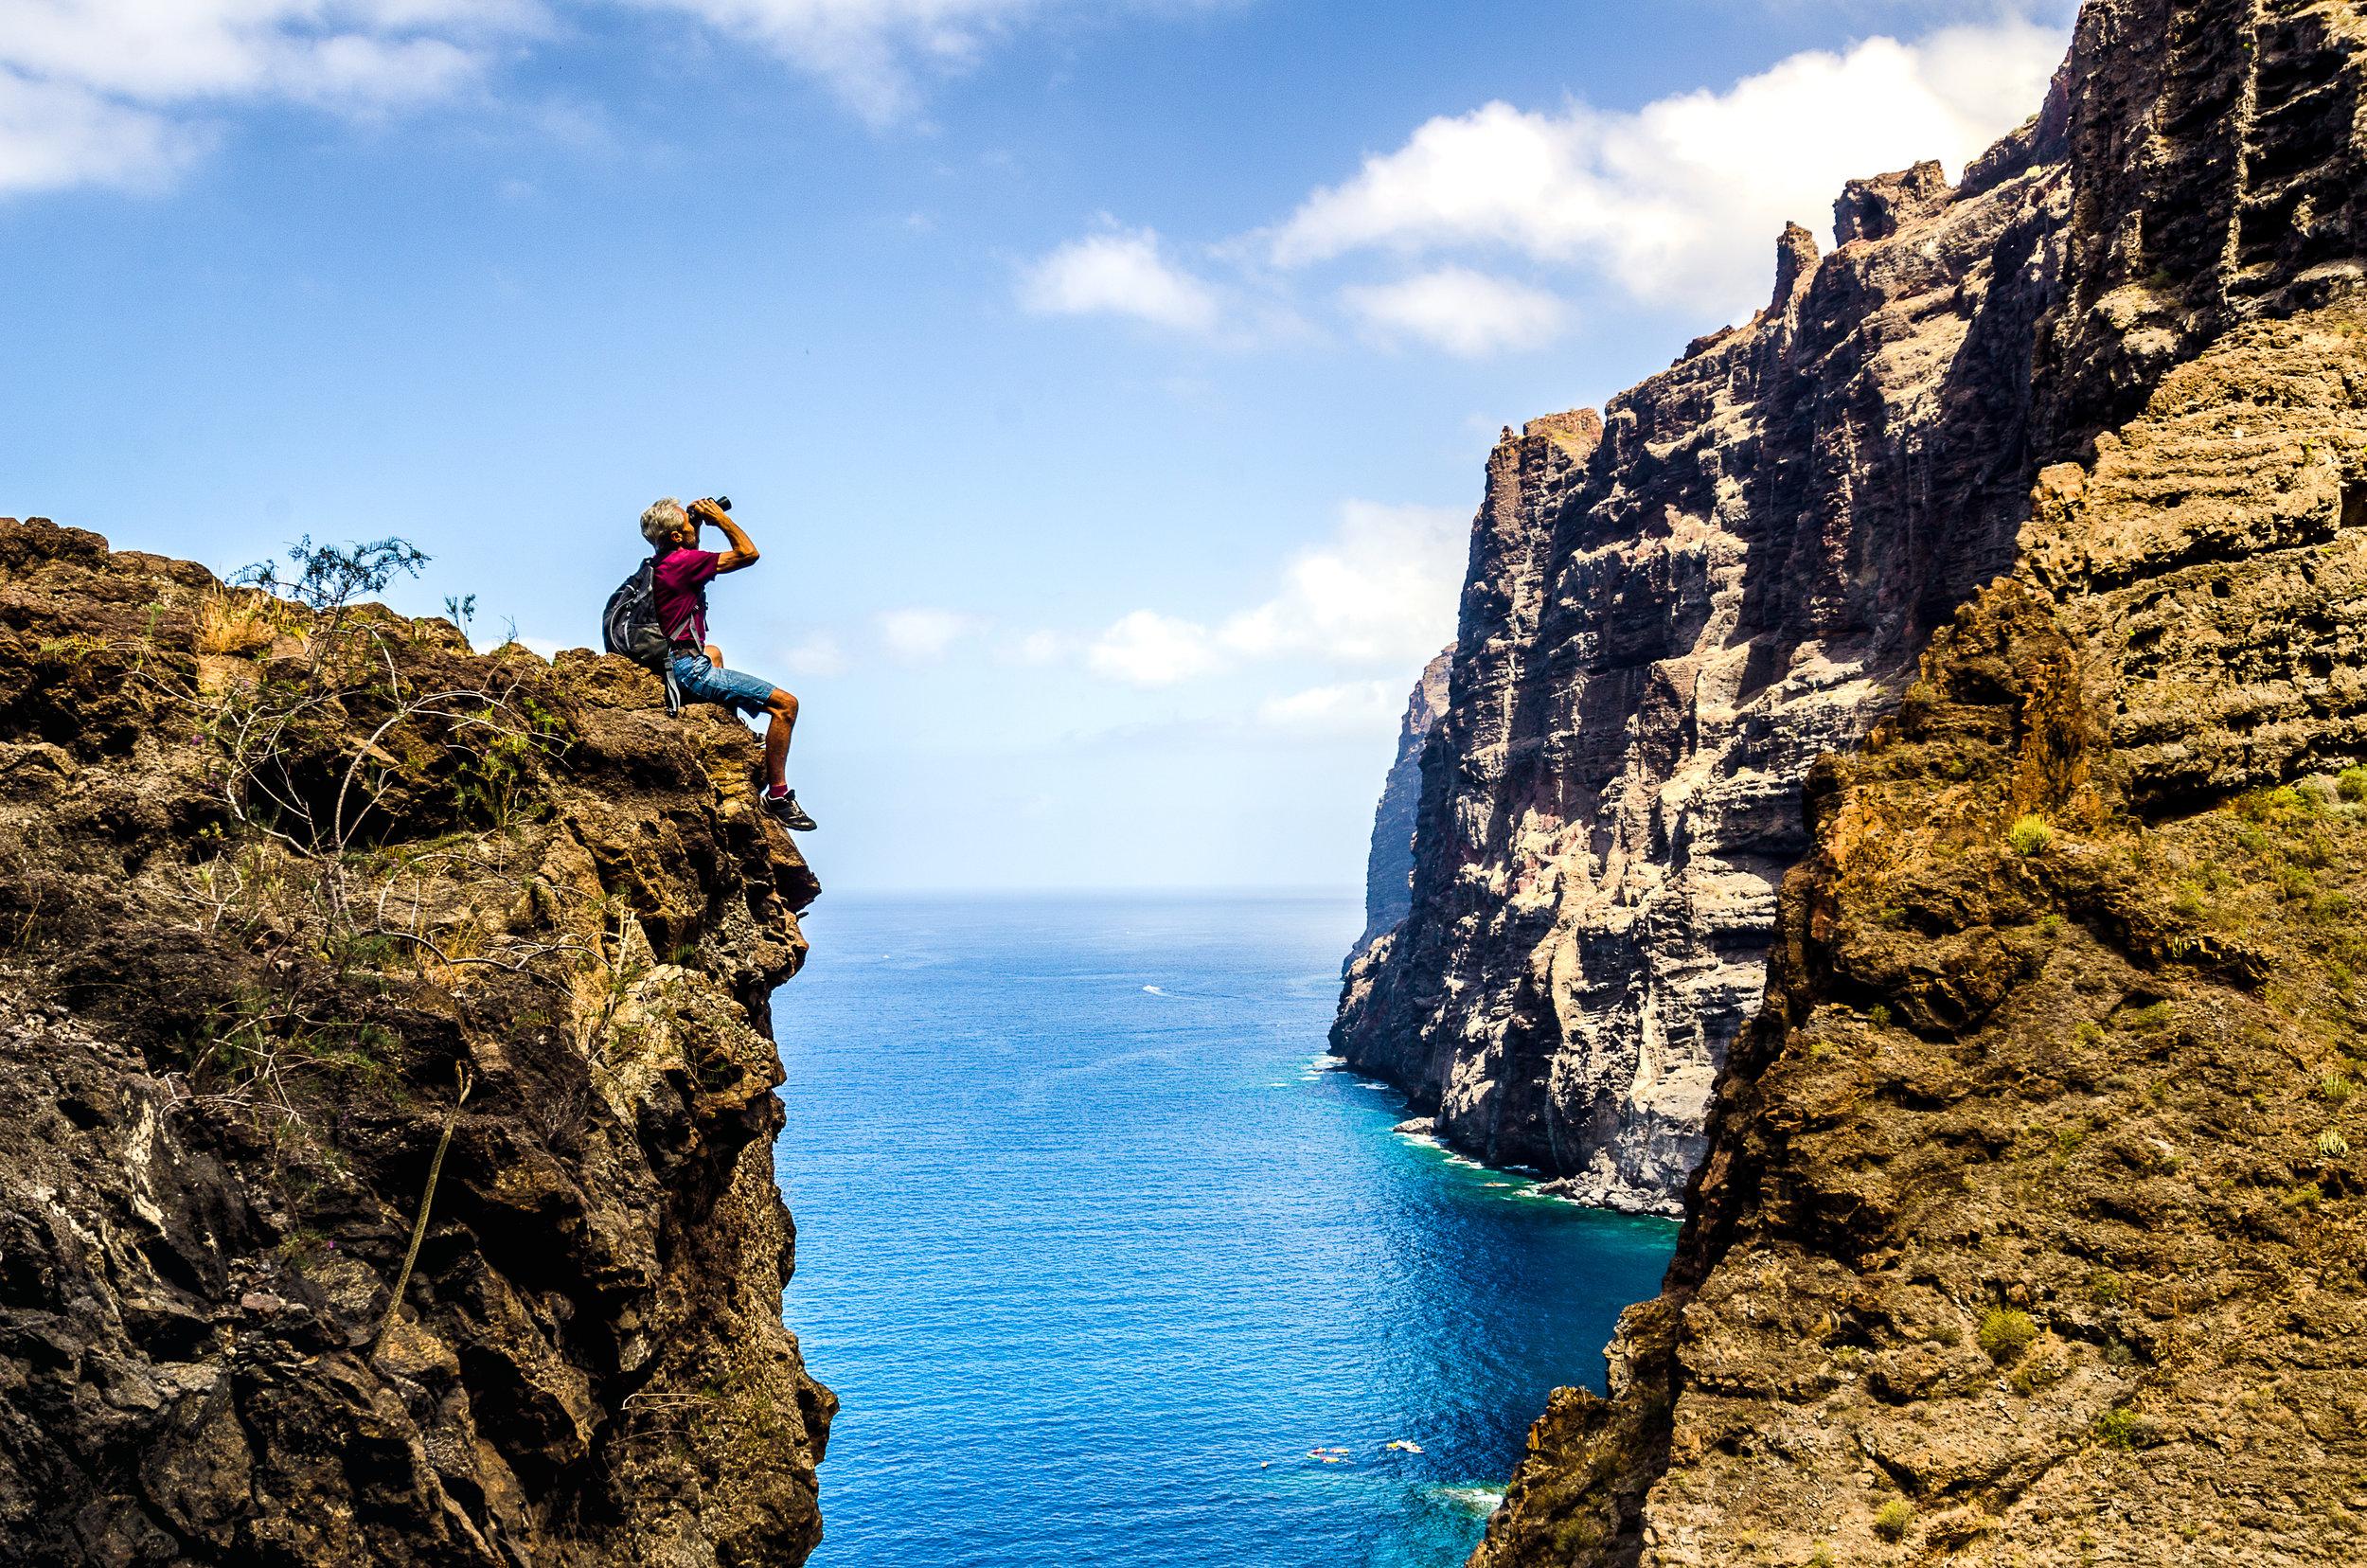 sight_los_gigantes_cliffs_tenerife_spain.jpg